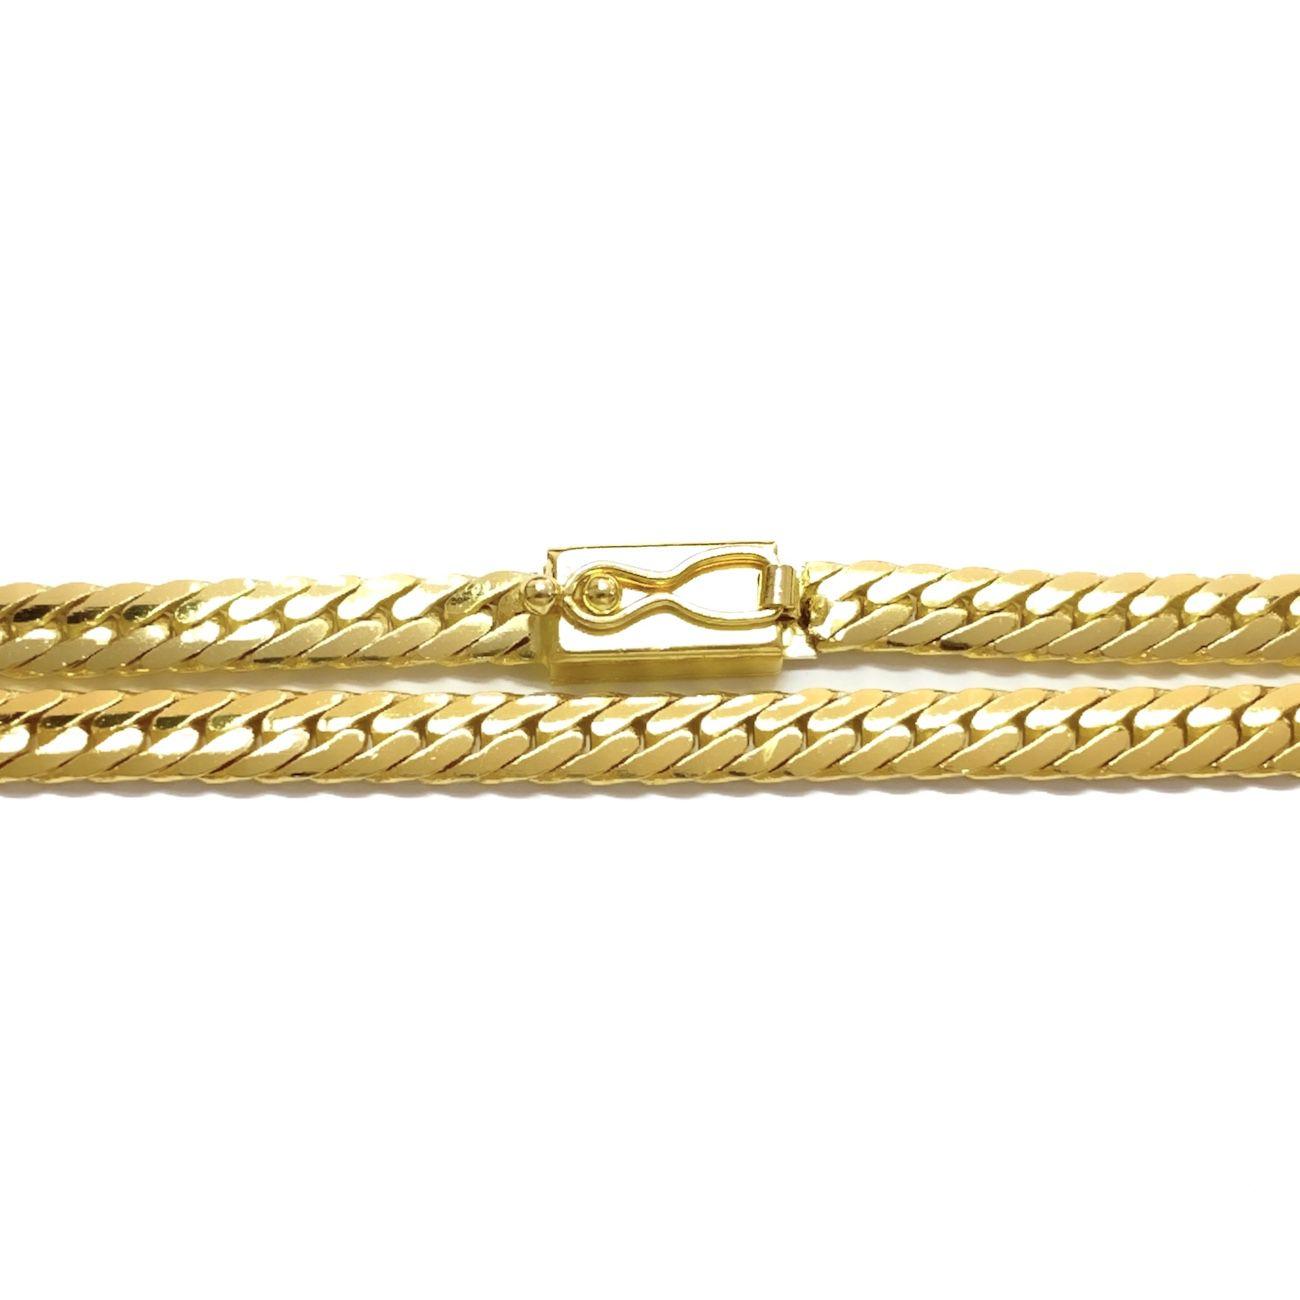 Corrente Lacraia 4,5mm 60cm 26g (Fecho gaveta) (Banho Ouro 24k)